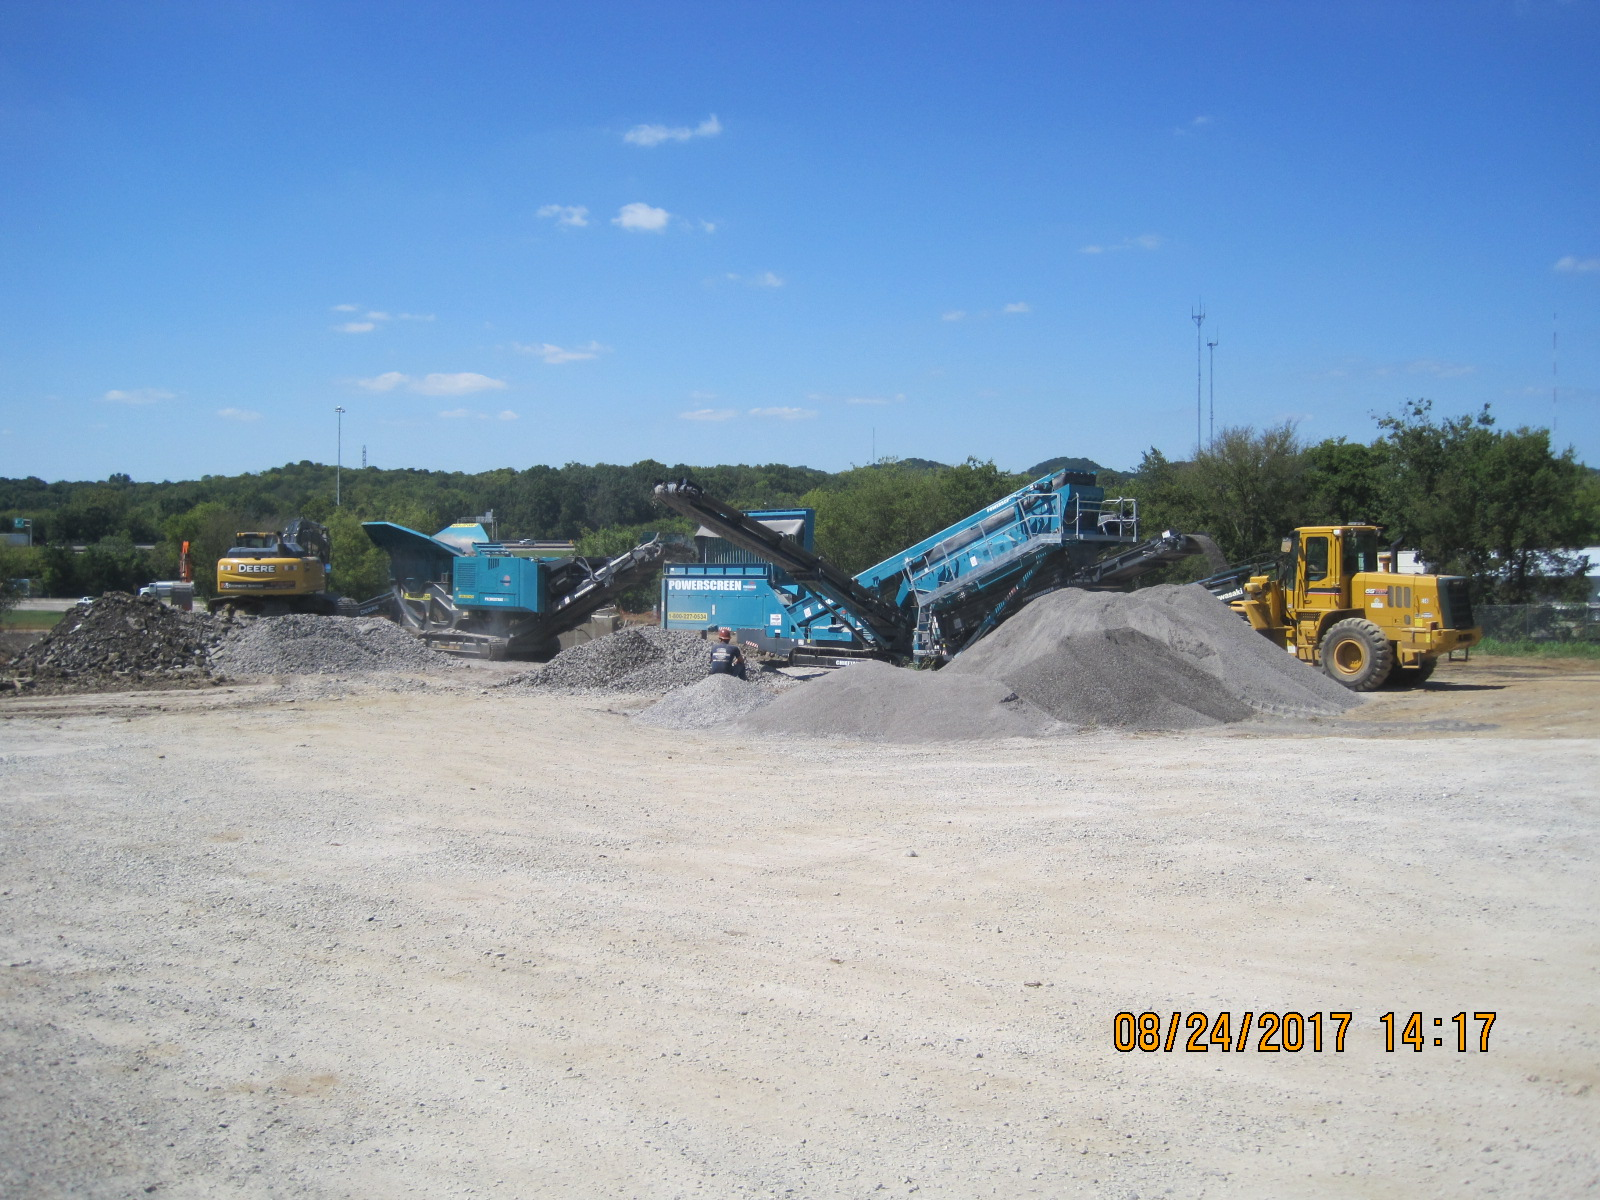 Excavating and Running Rock Crushers